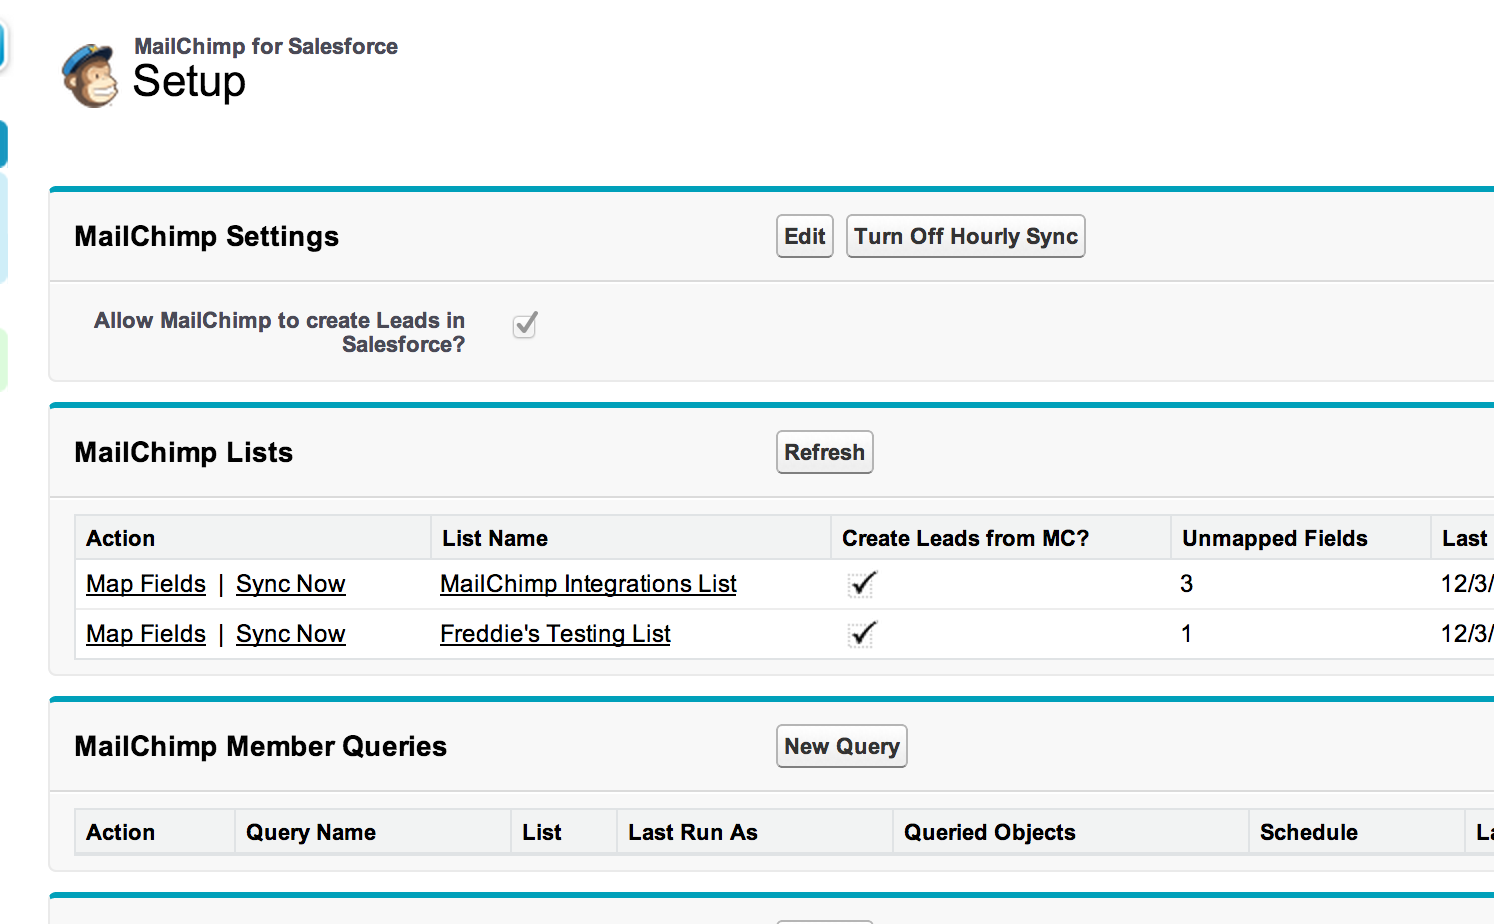 mailchimp for salesforce screenshot